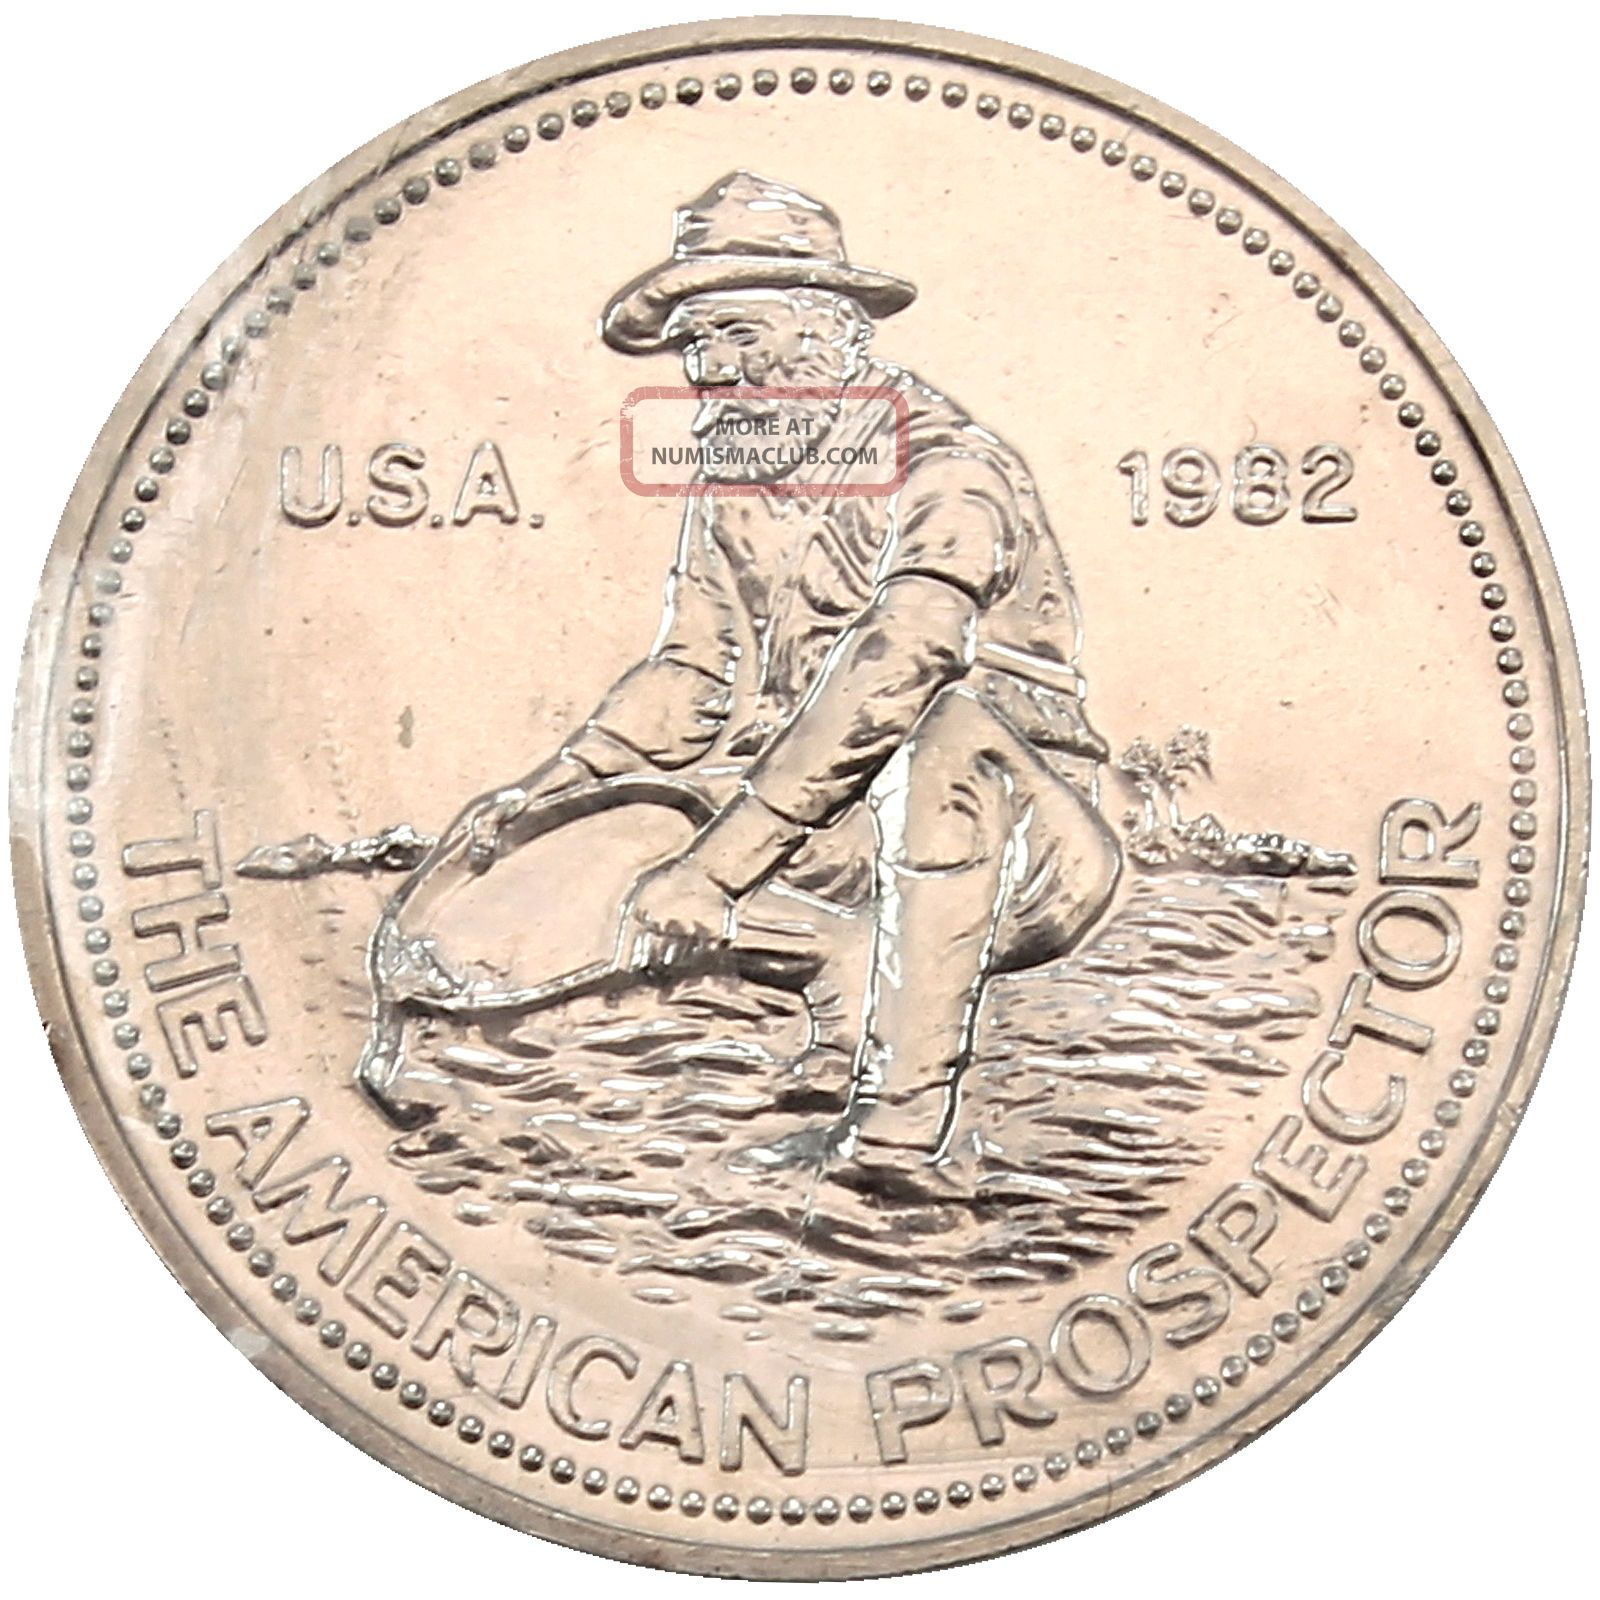 1982 Engelhard American Prospector 1 Troy Oz 999 Fine